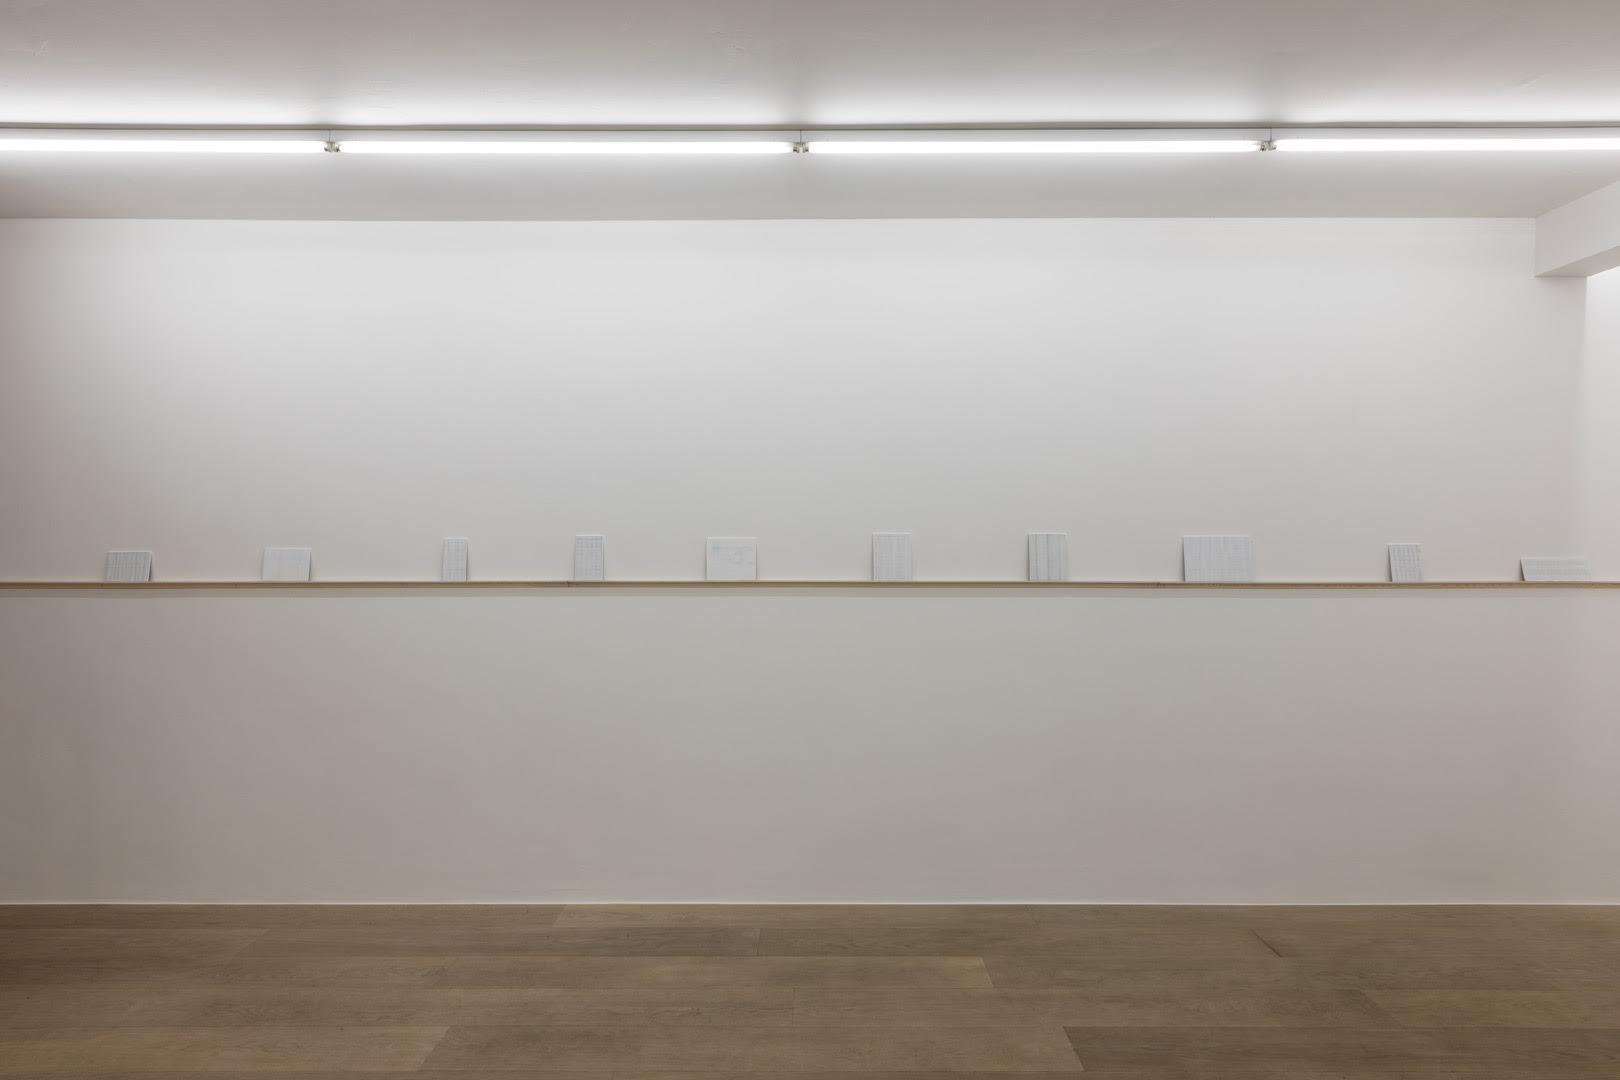 Pierre Sohie . Bruit blanc  Side view